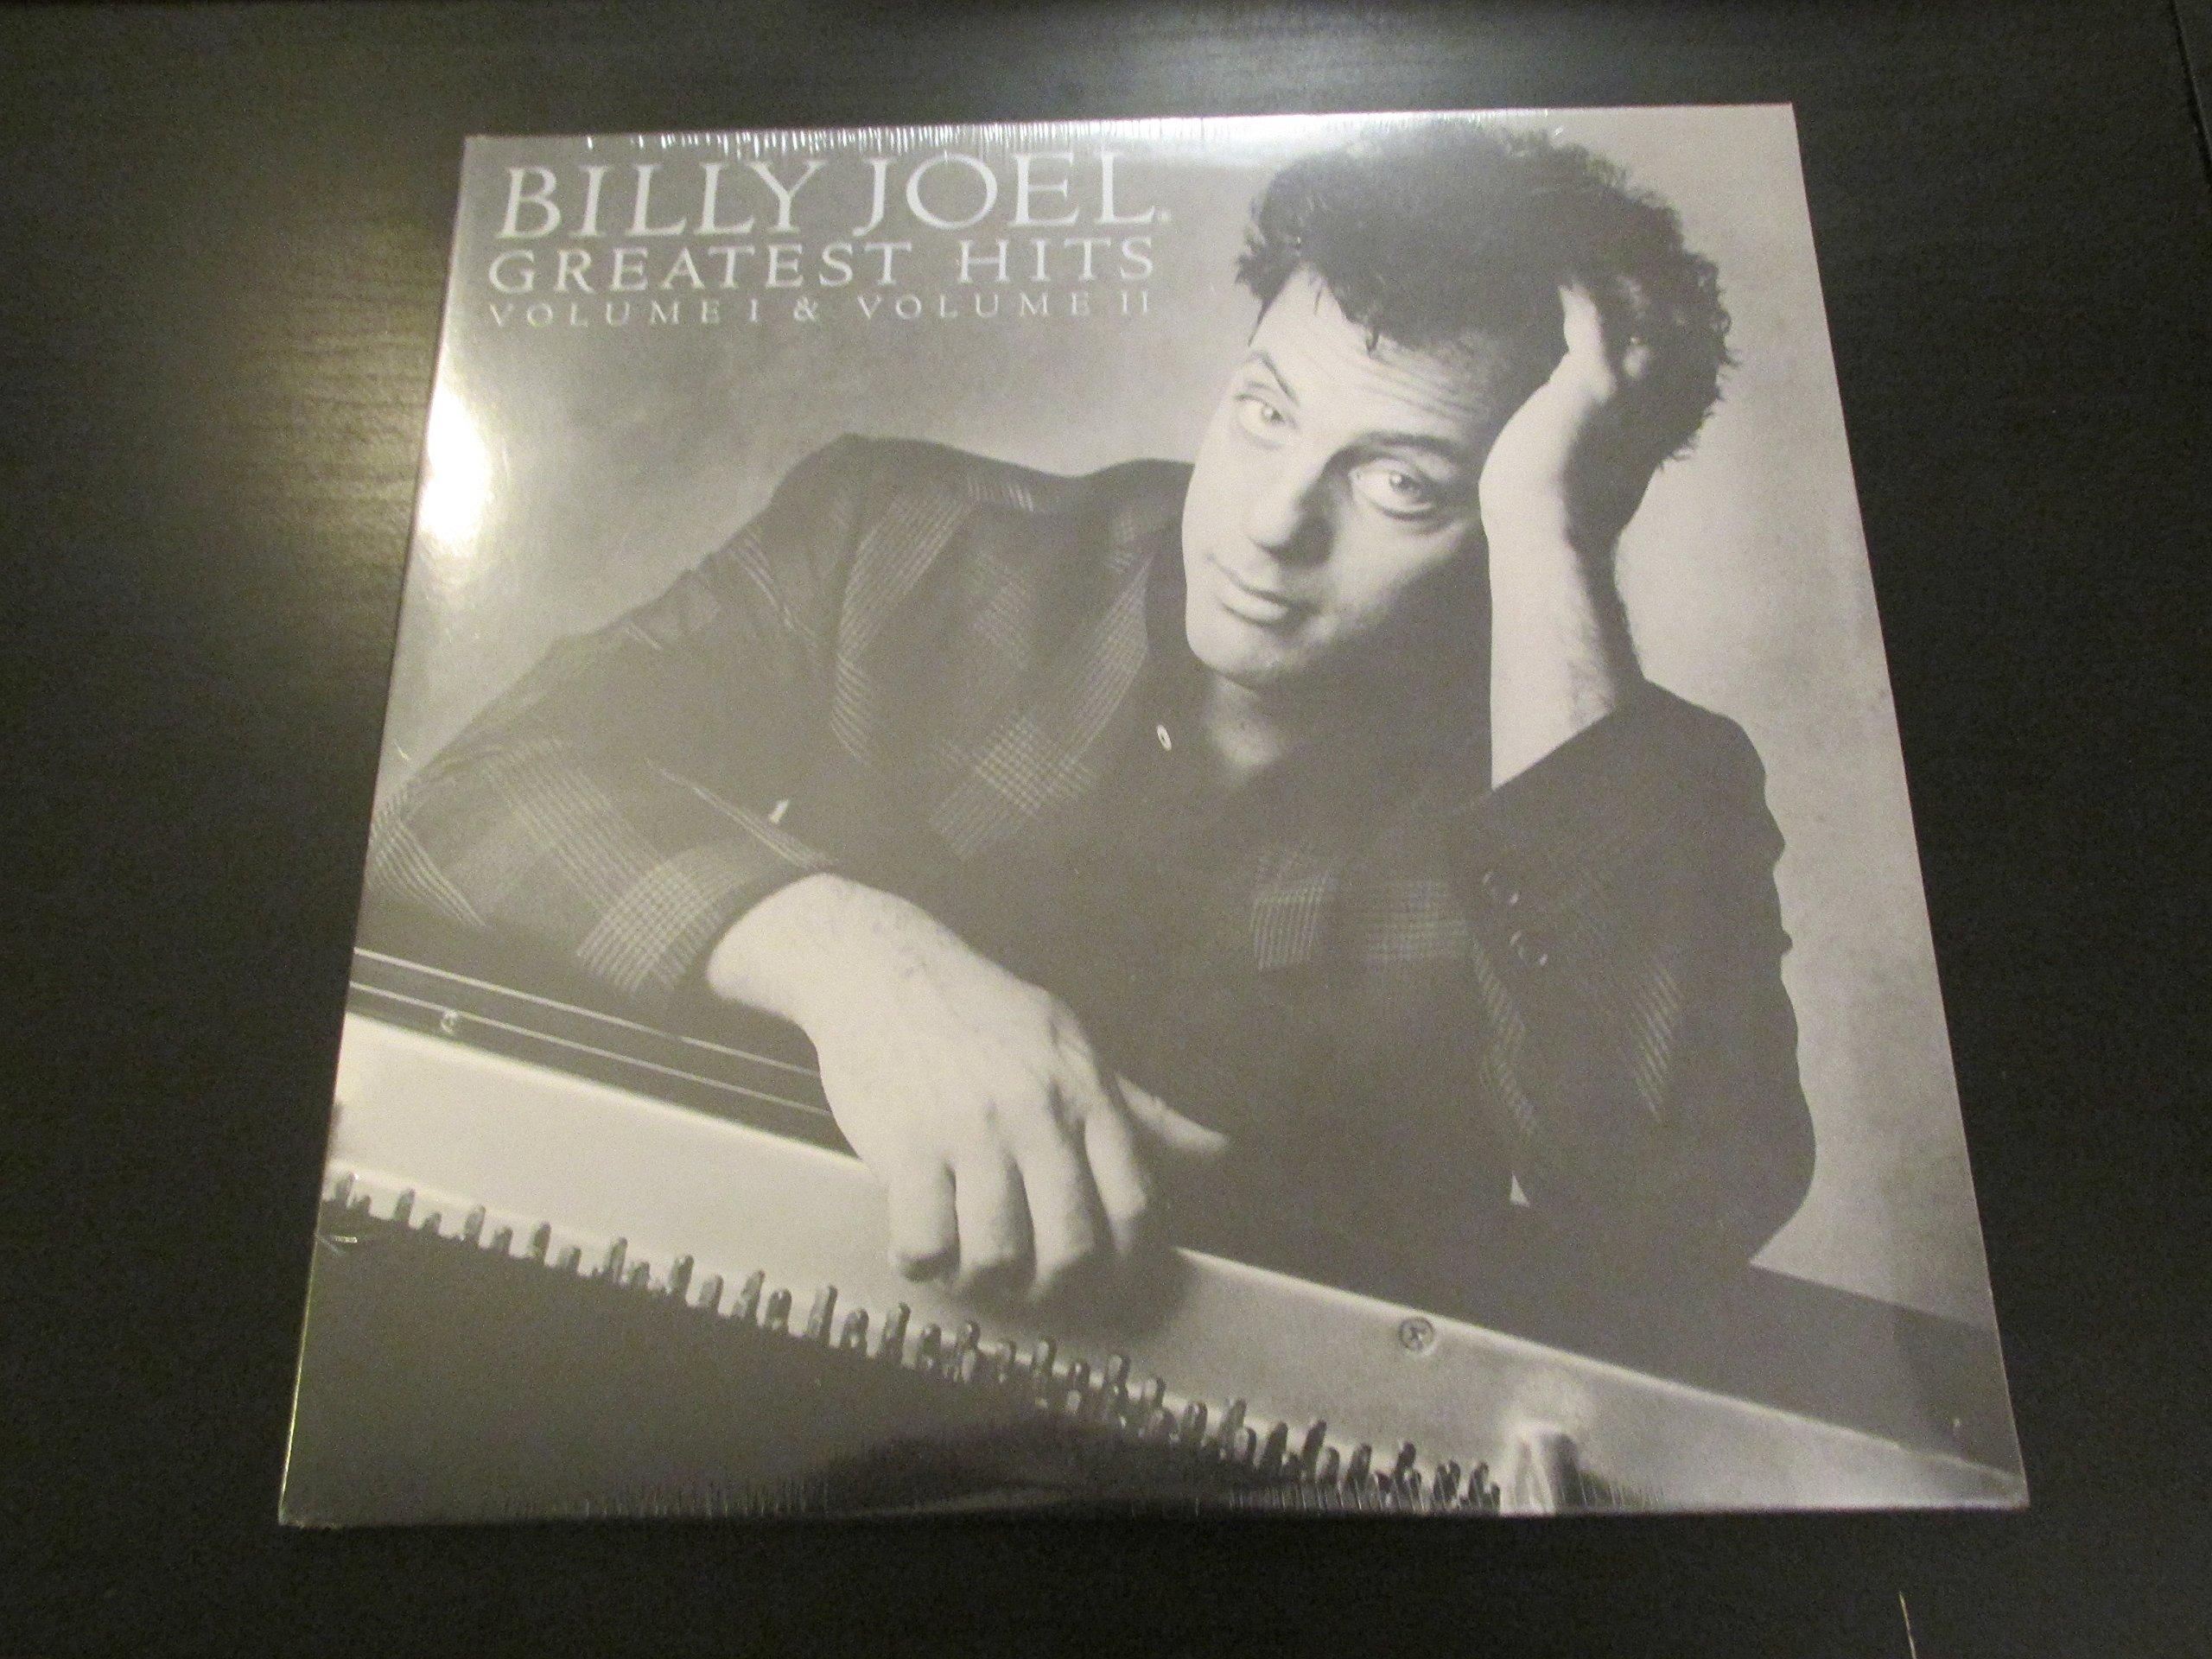 Billy Joel: Greatest Hits, Volume 1 & 2